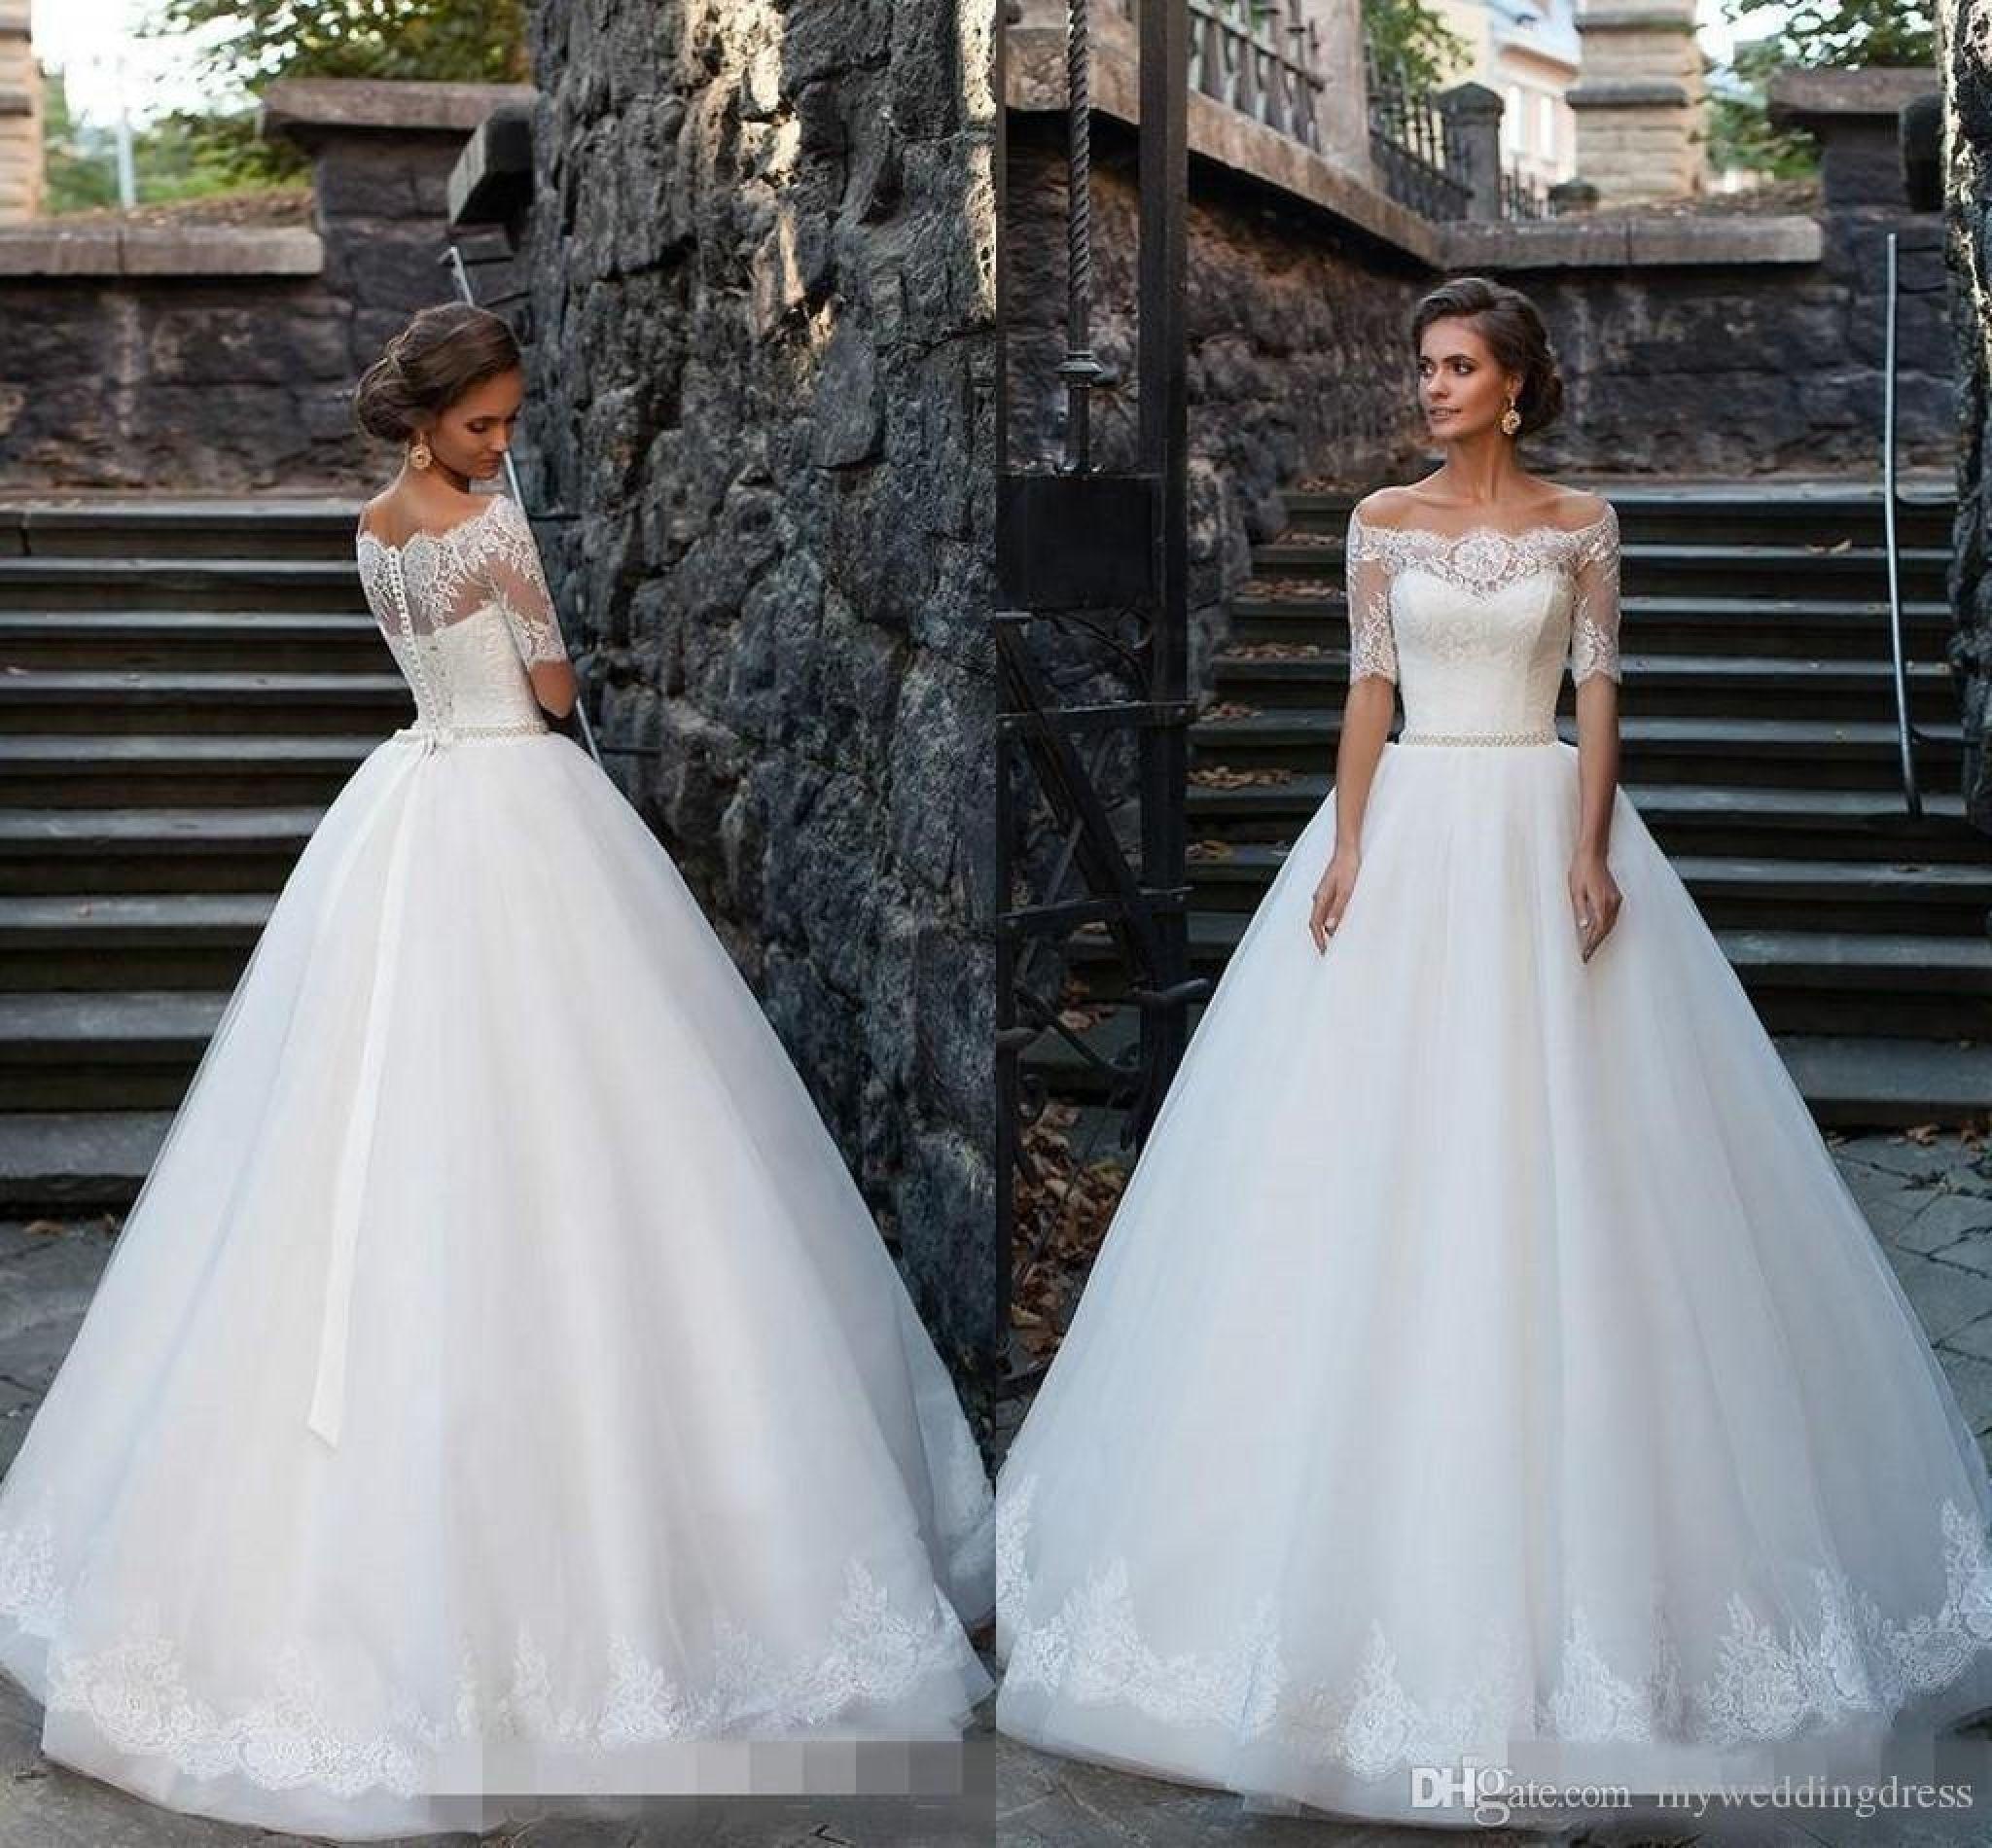 princess wedding dresses cheap - plus size dresses for wedding ...